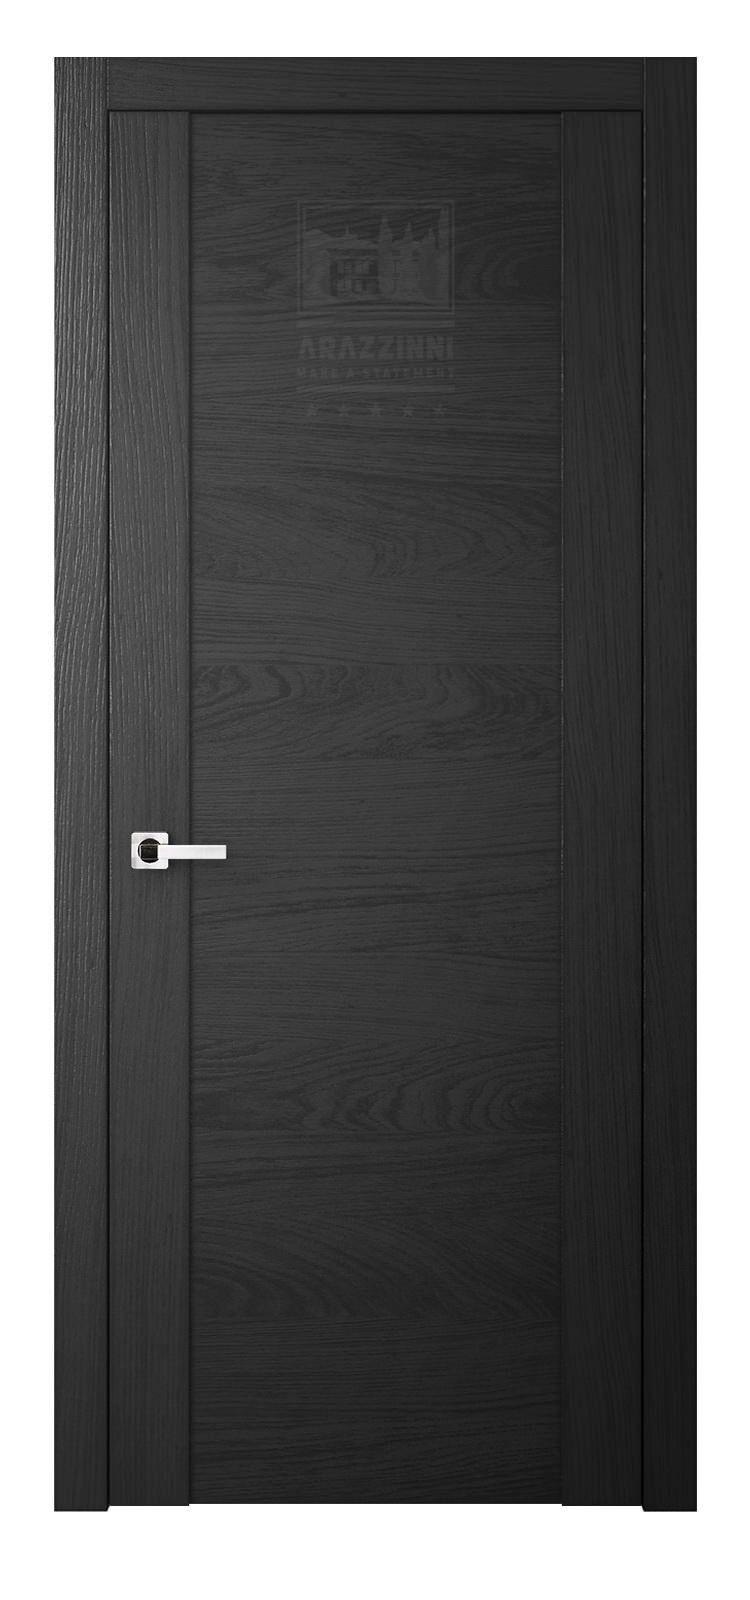 Arazzinni Quadro Q6011 Interior Door Black Oak House Pinterest